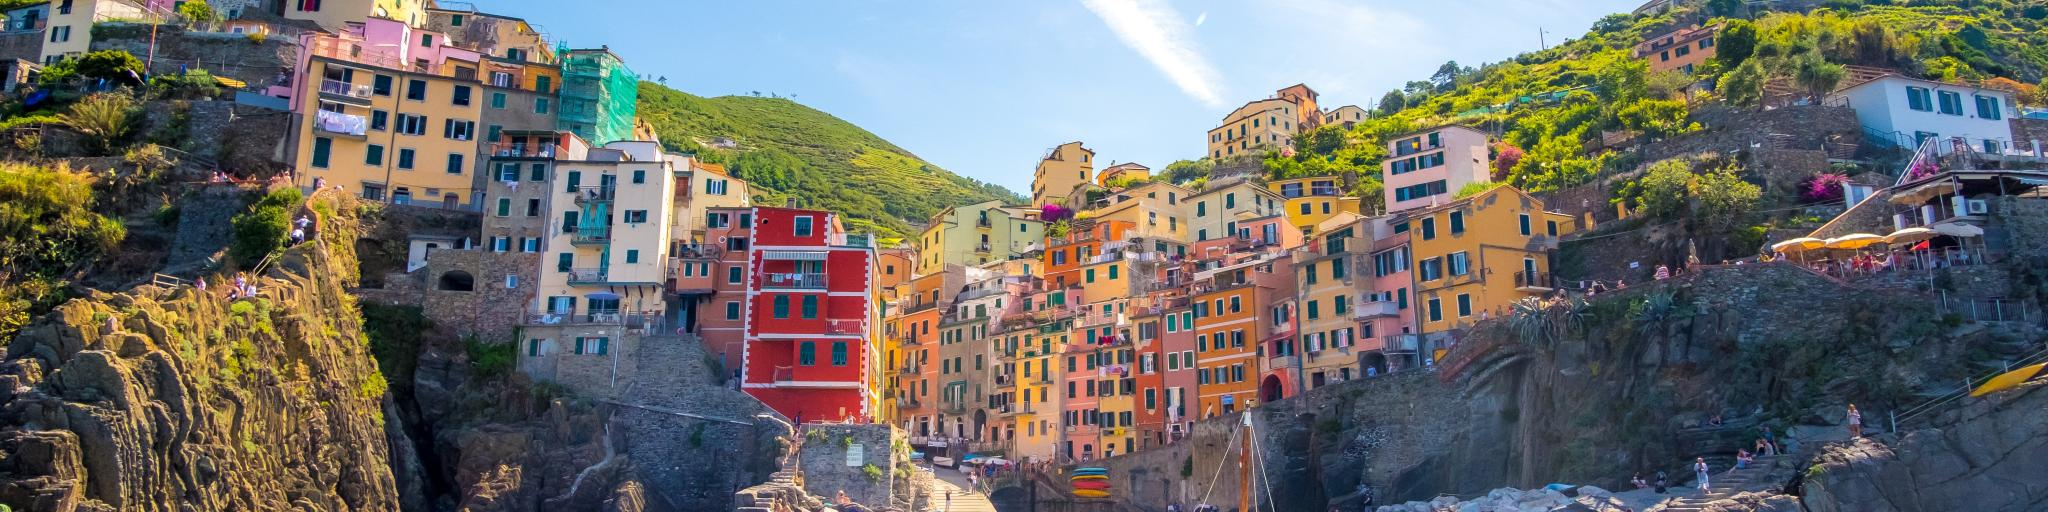 Colourful buildings and a boat on the sea in Riomaggiore, Italy